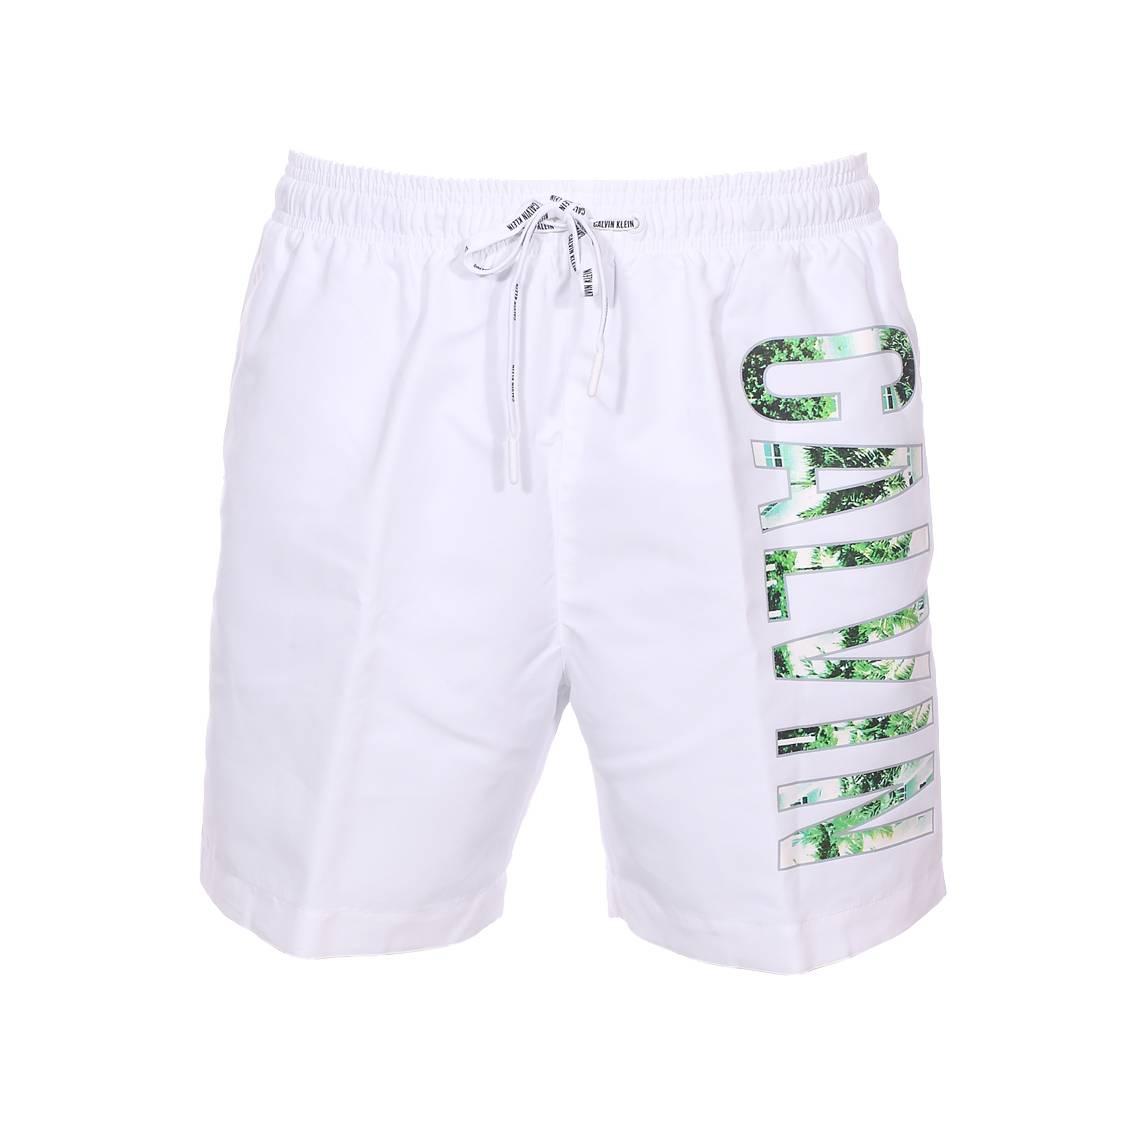 Short de bain Calvin Klein blanc, floquage à motifs